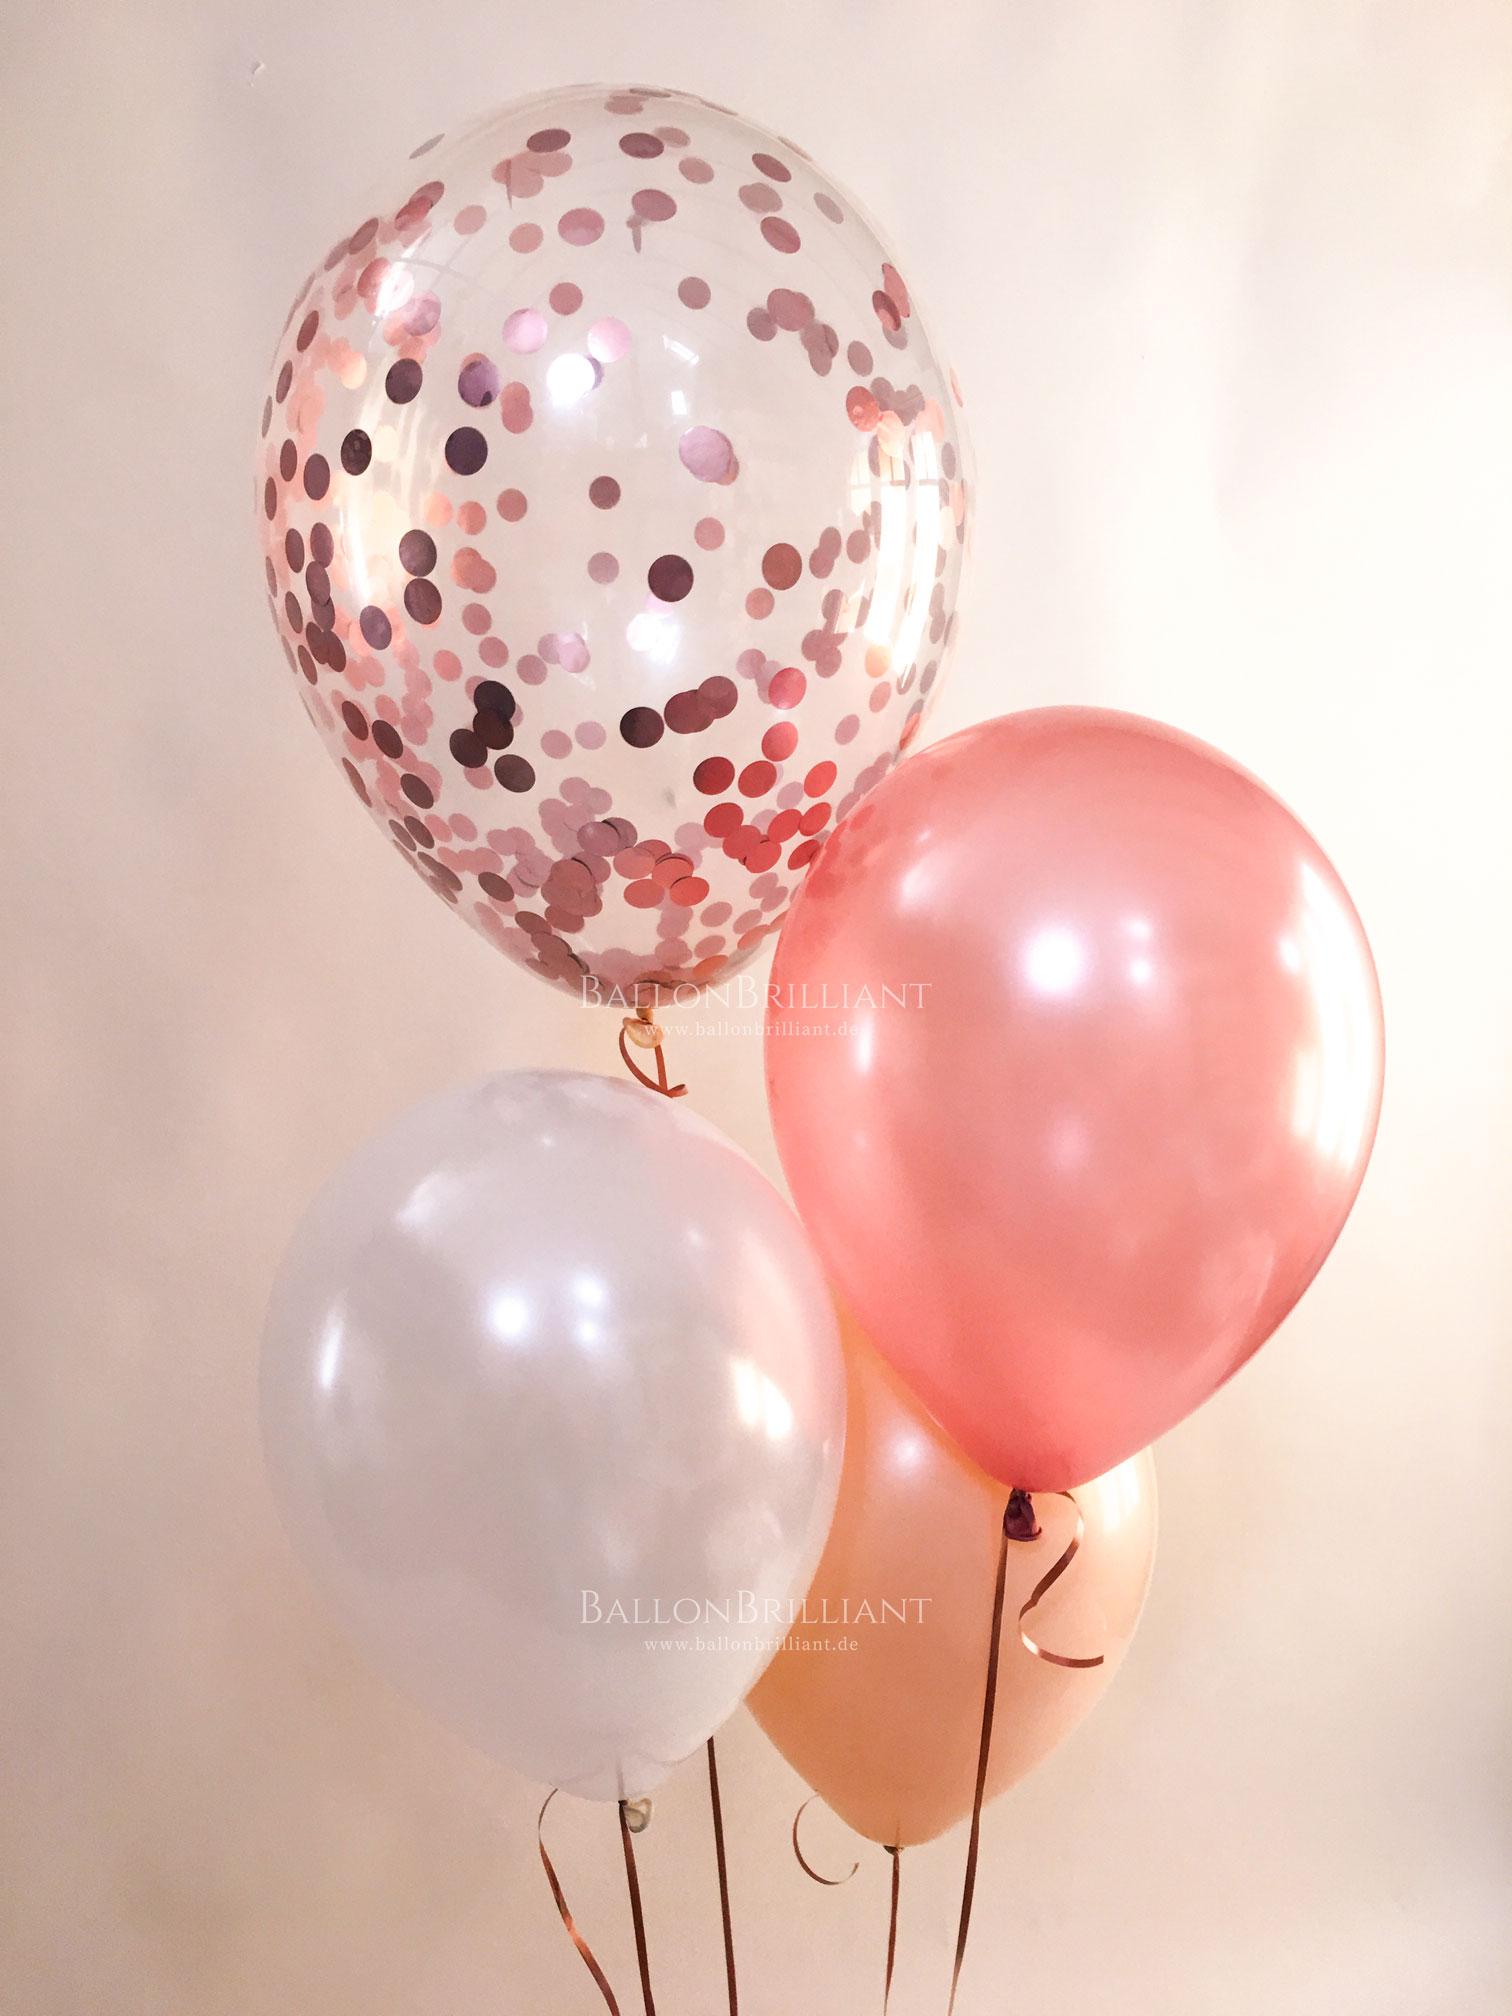 BallonBrilliant Ballonstrauß mit Konfetti Apricot Peach